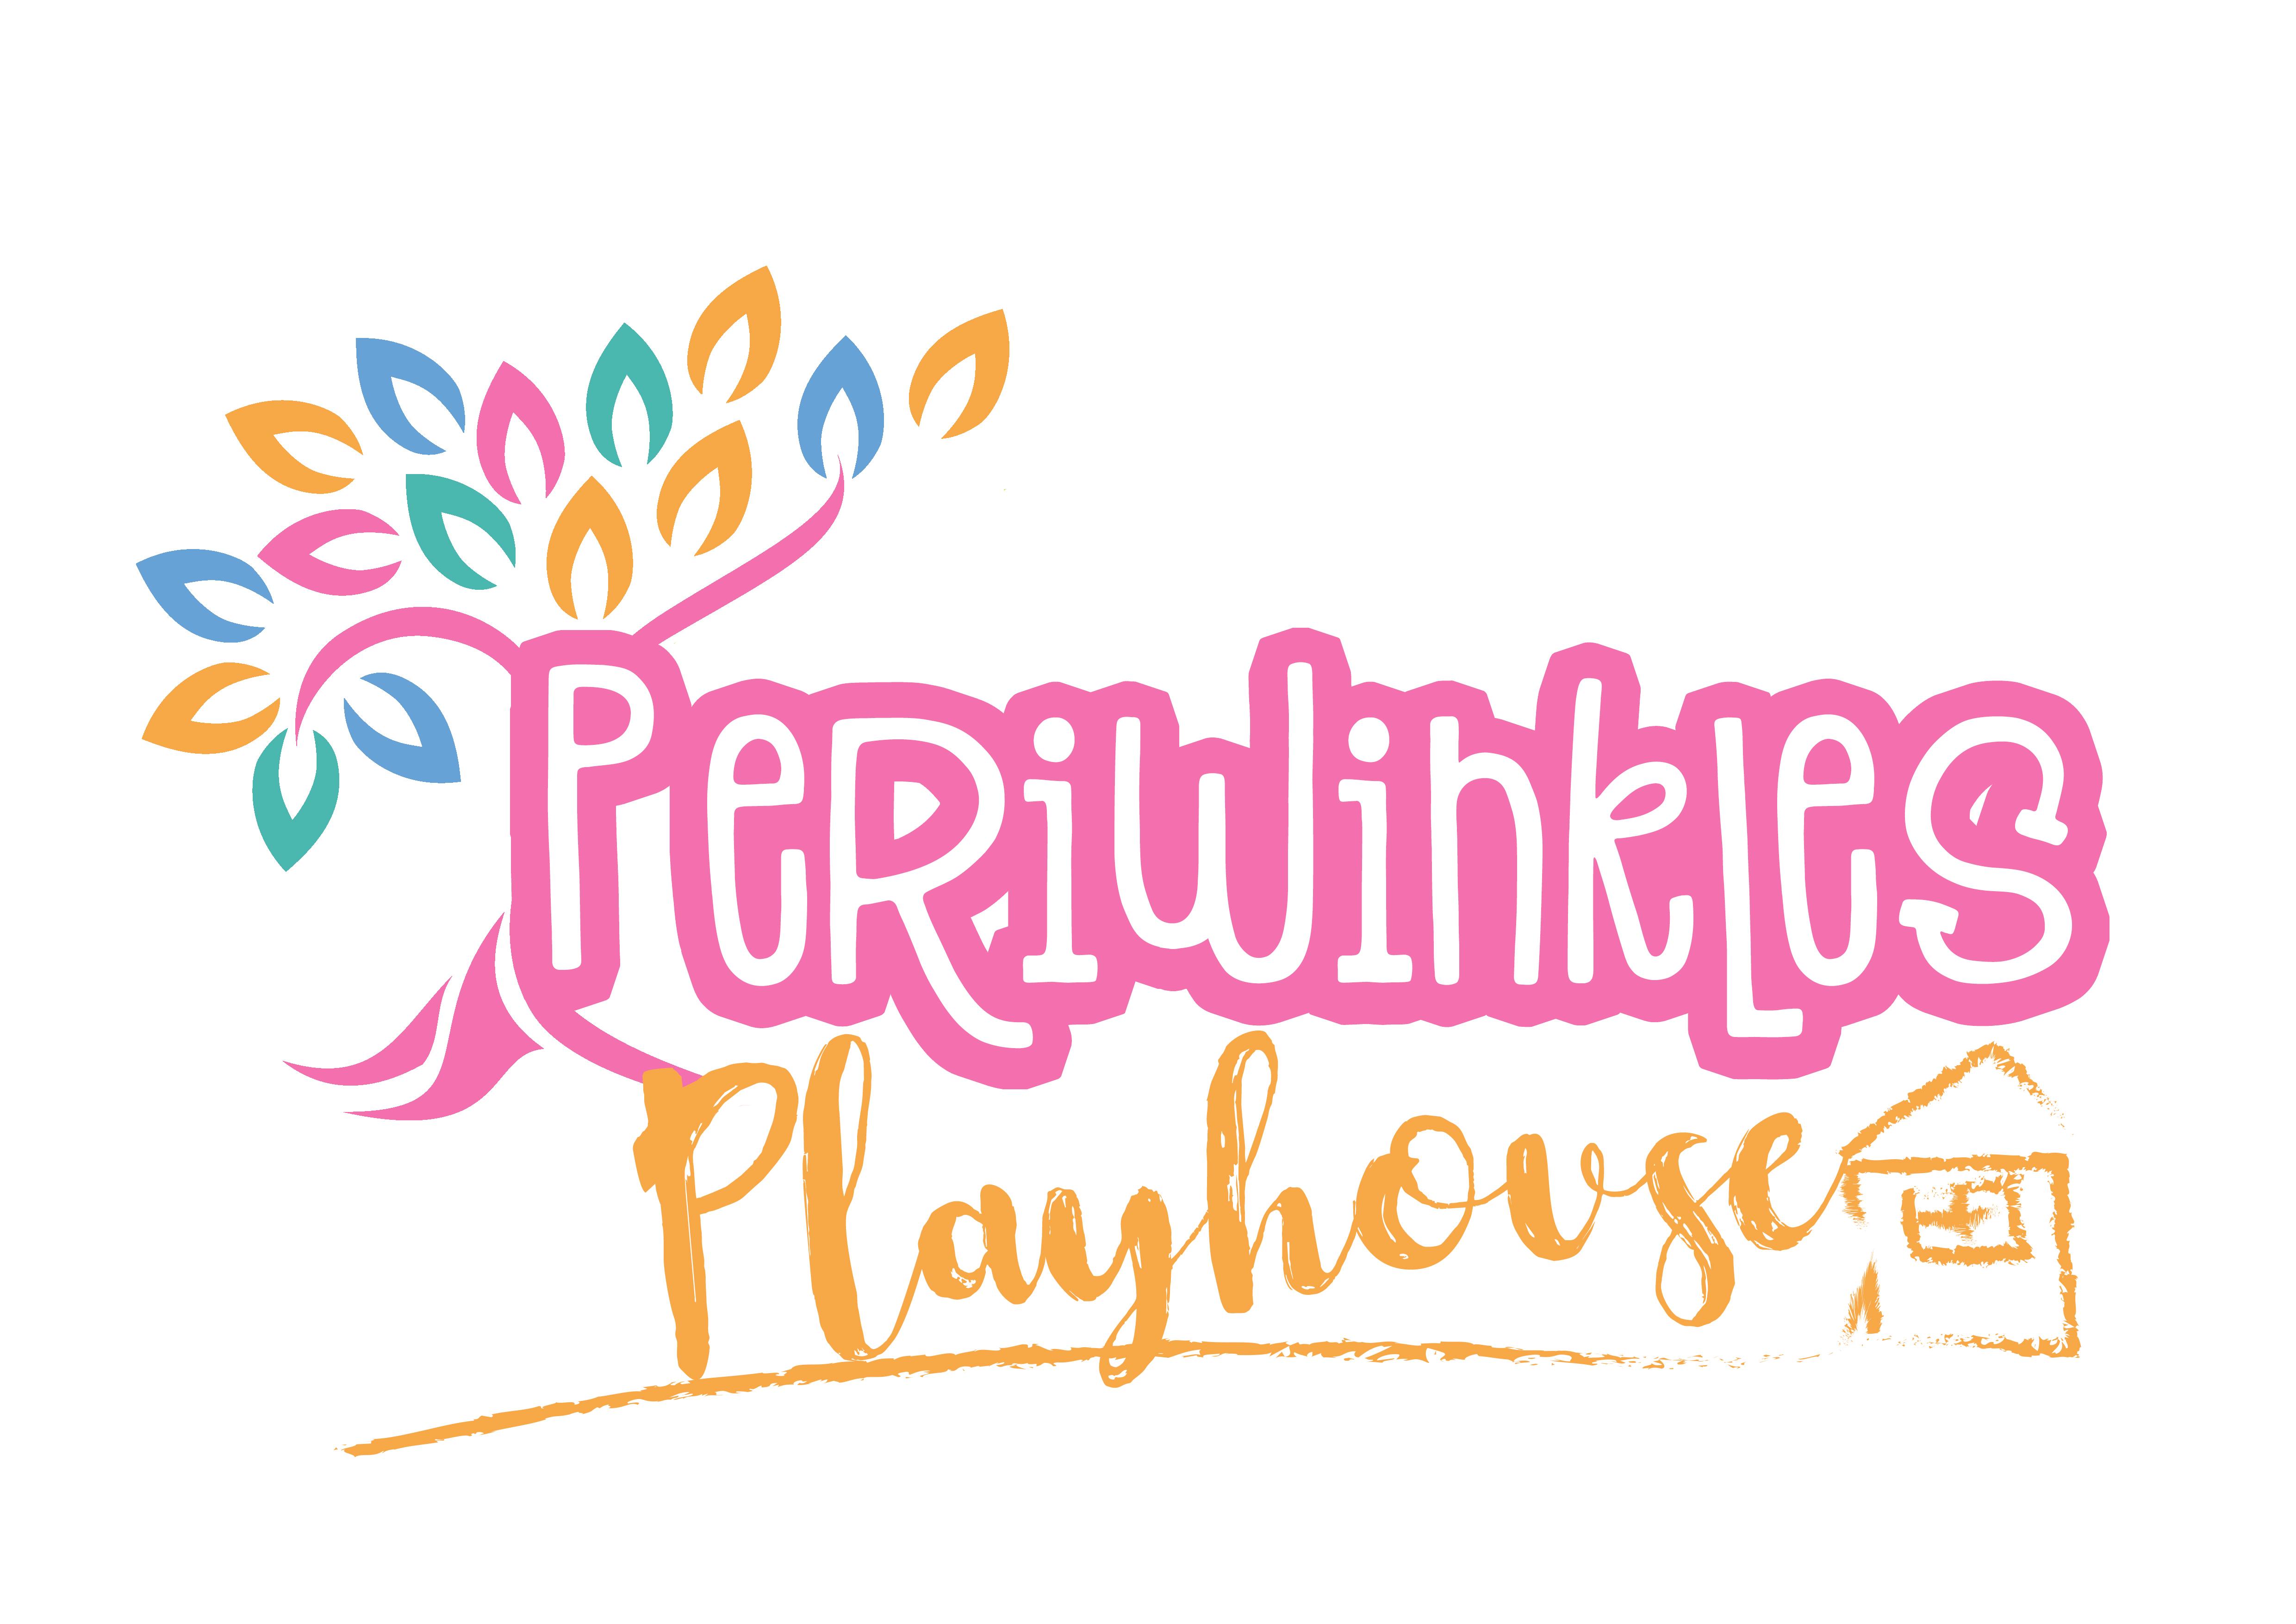 Periwinkles Playhouse copy